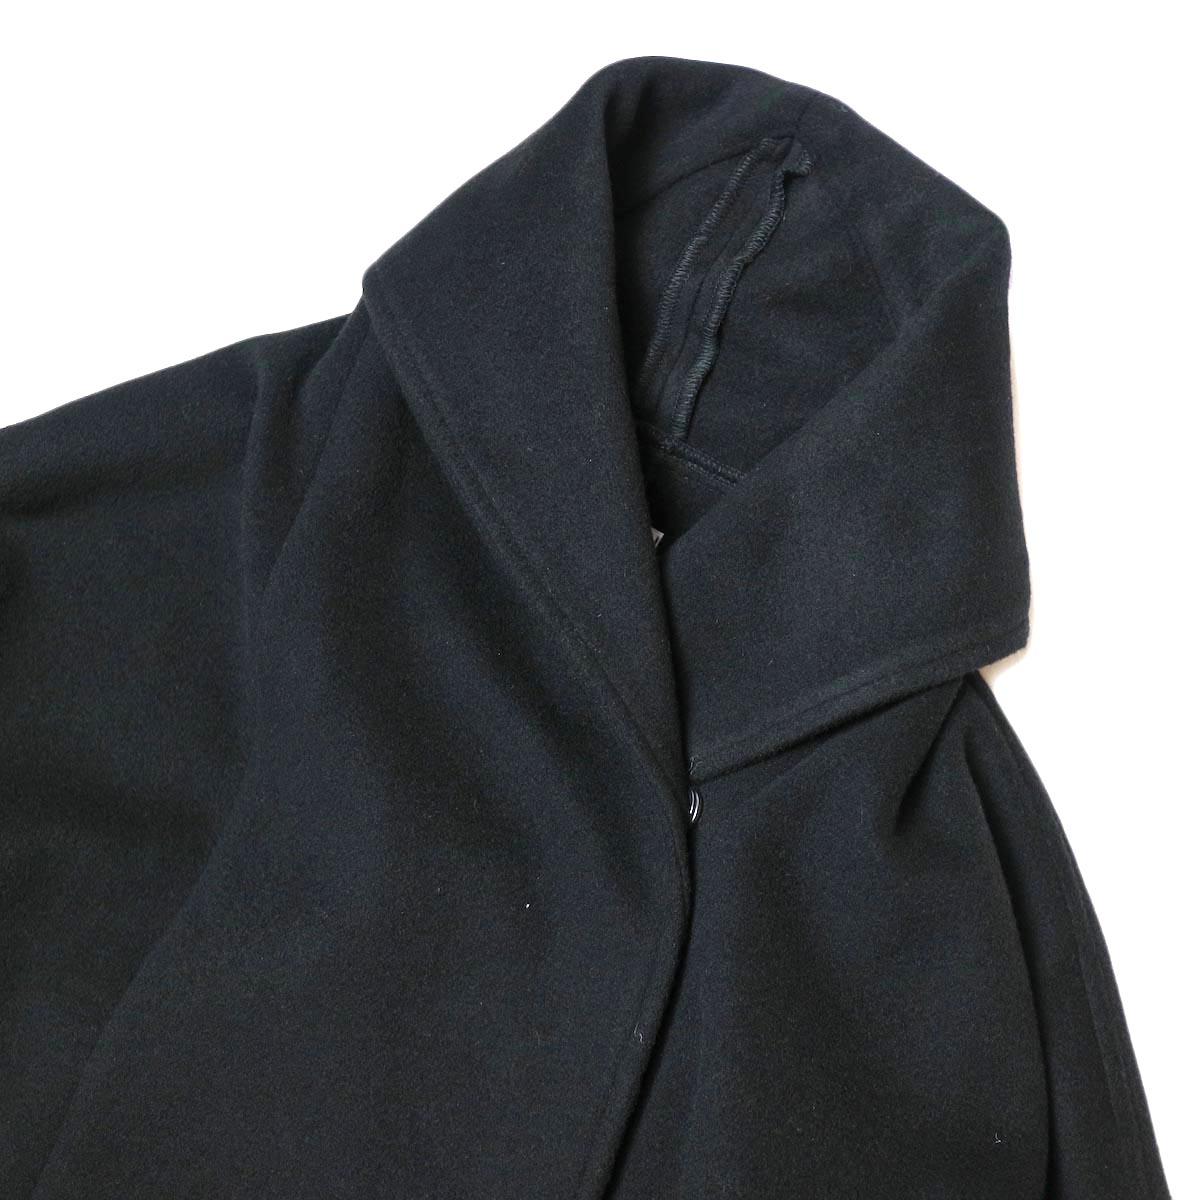 Honnete / Shawl Collar Wide Coat (Black) 襟